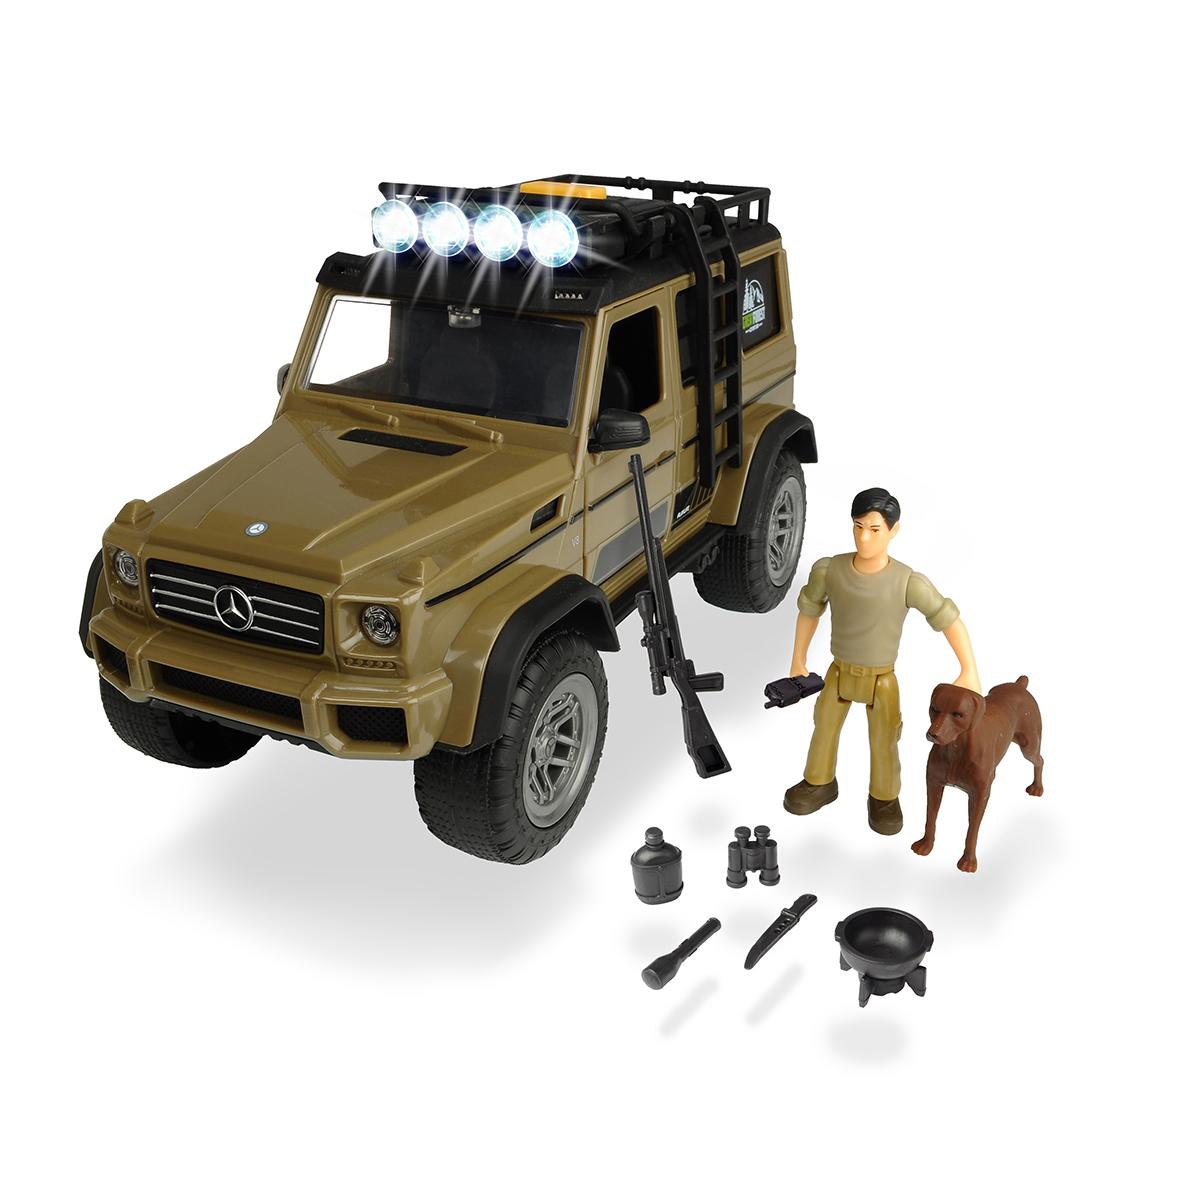 Set Masinuta Mercedes cu figurina Dickie Playlife Ranger